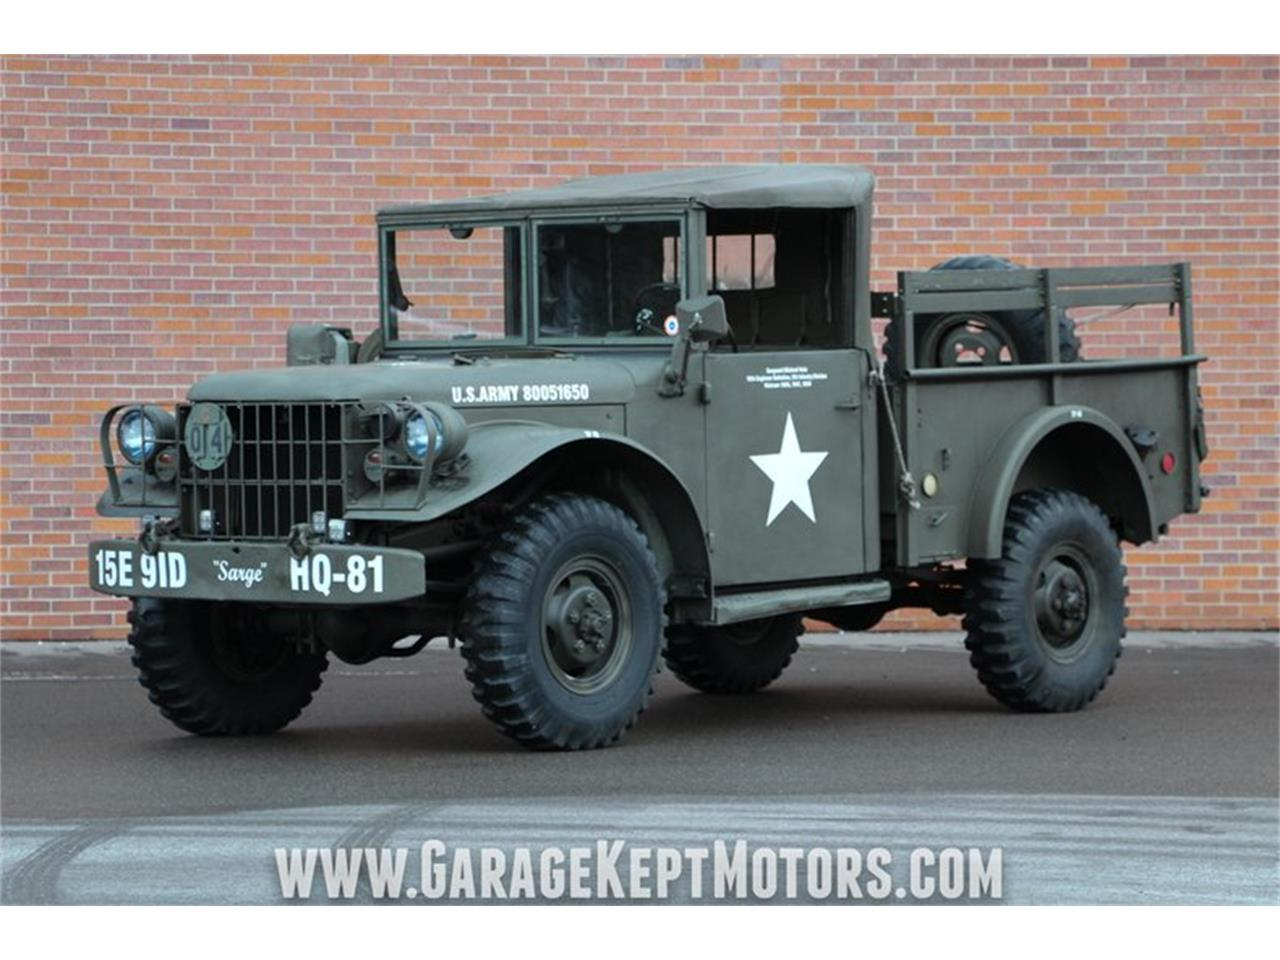 1951 Dodge M37 Transmission – 1970 Dodge Challenger on m37 engine, m37 truck navy, m37 truck parts,